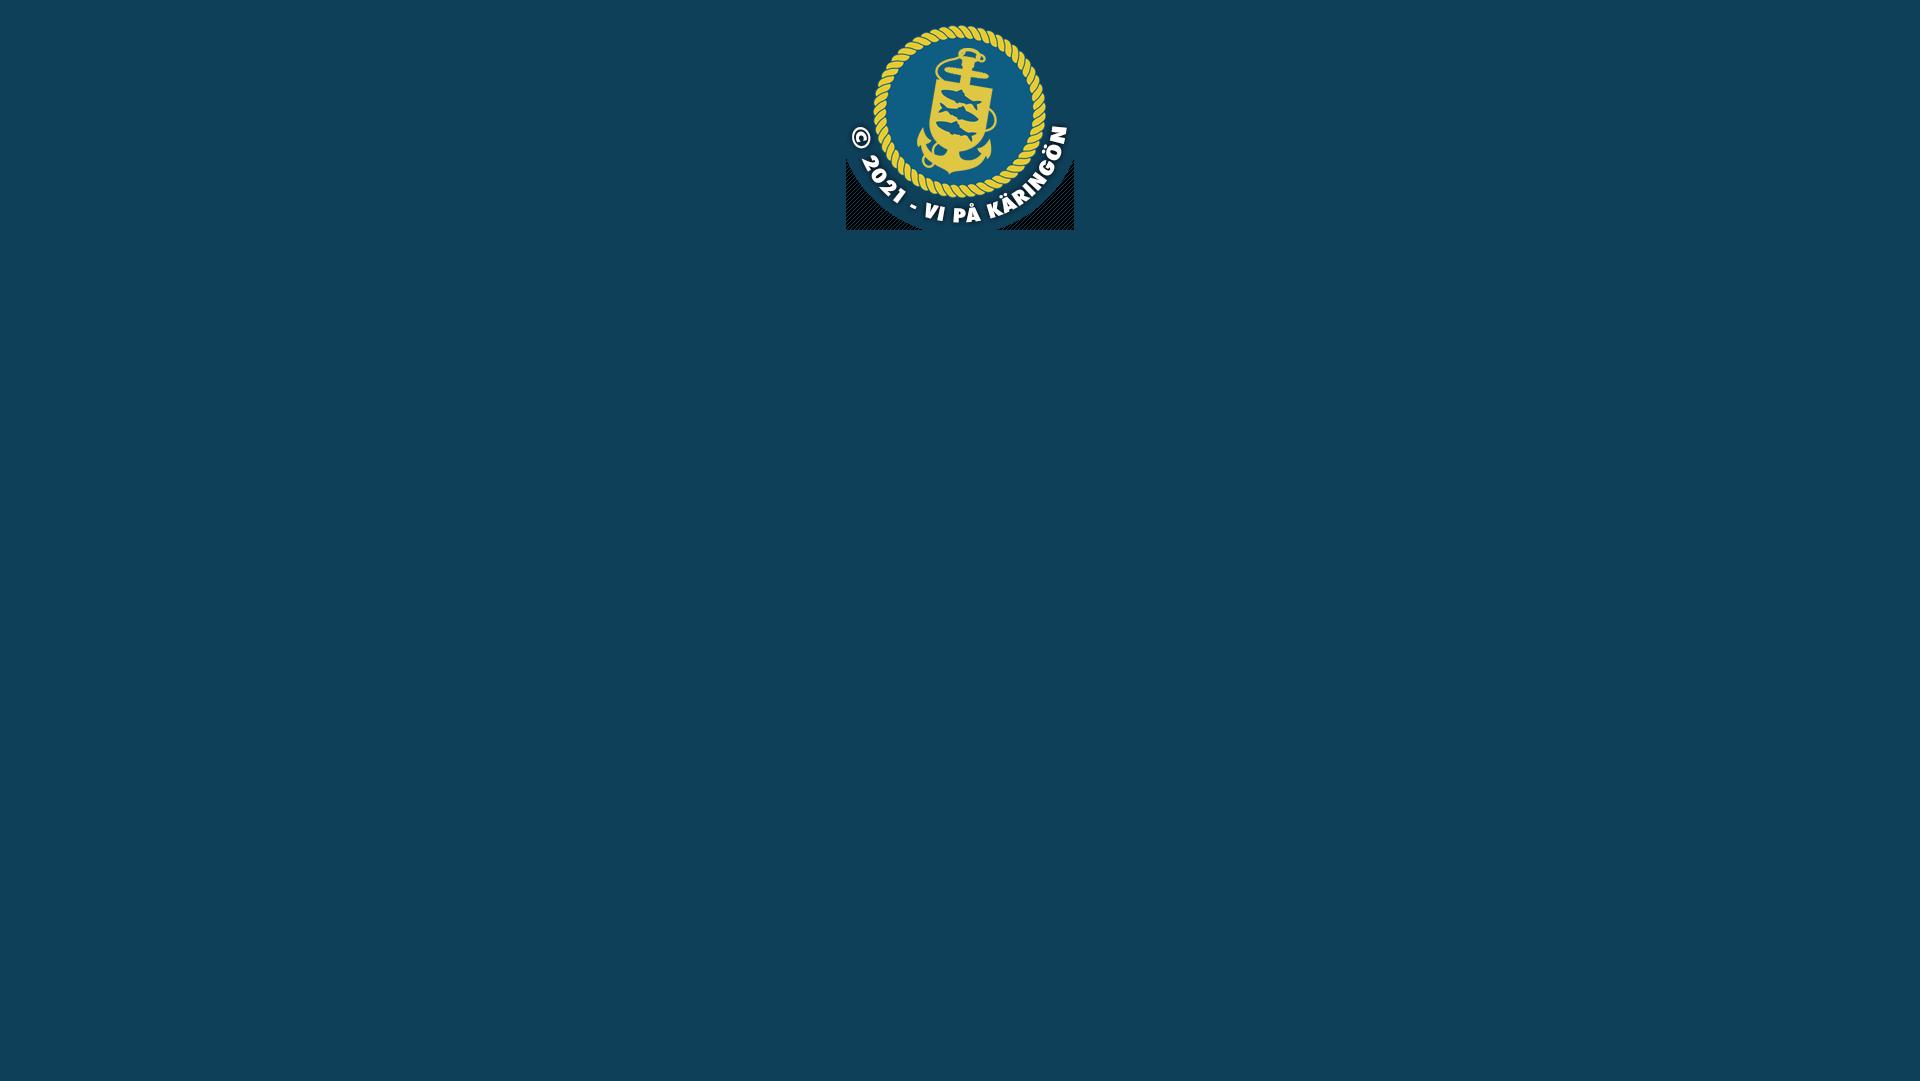 Main background